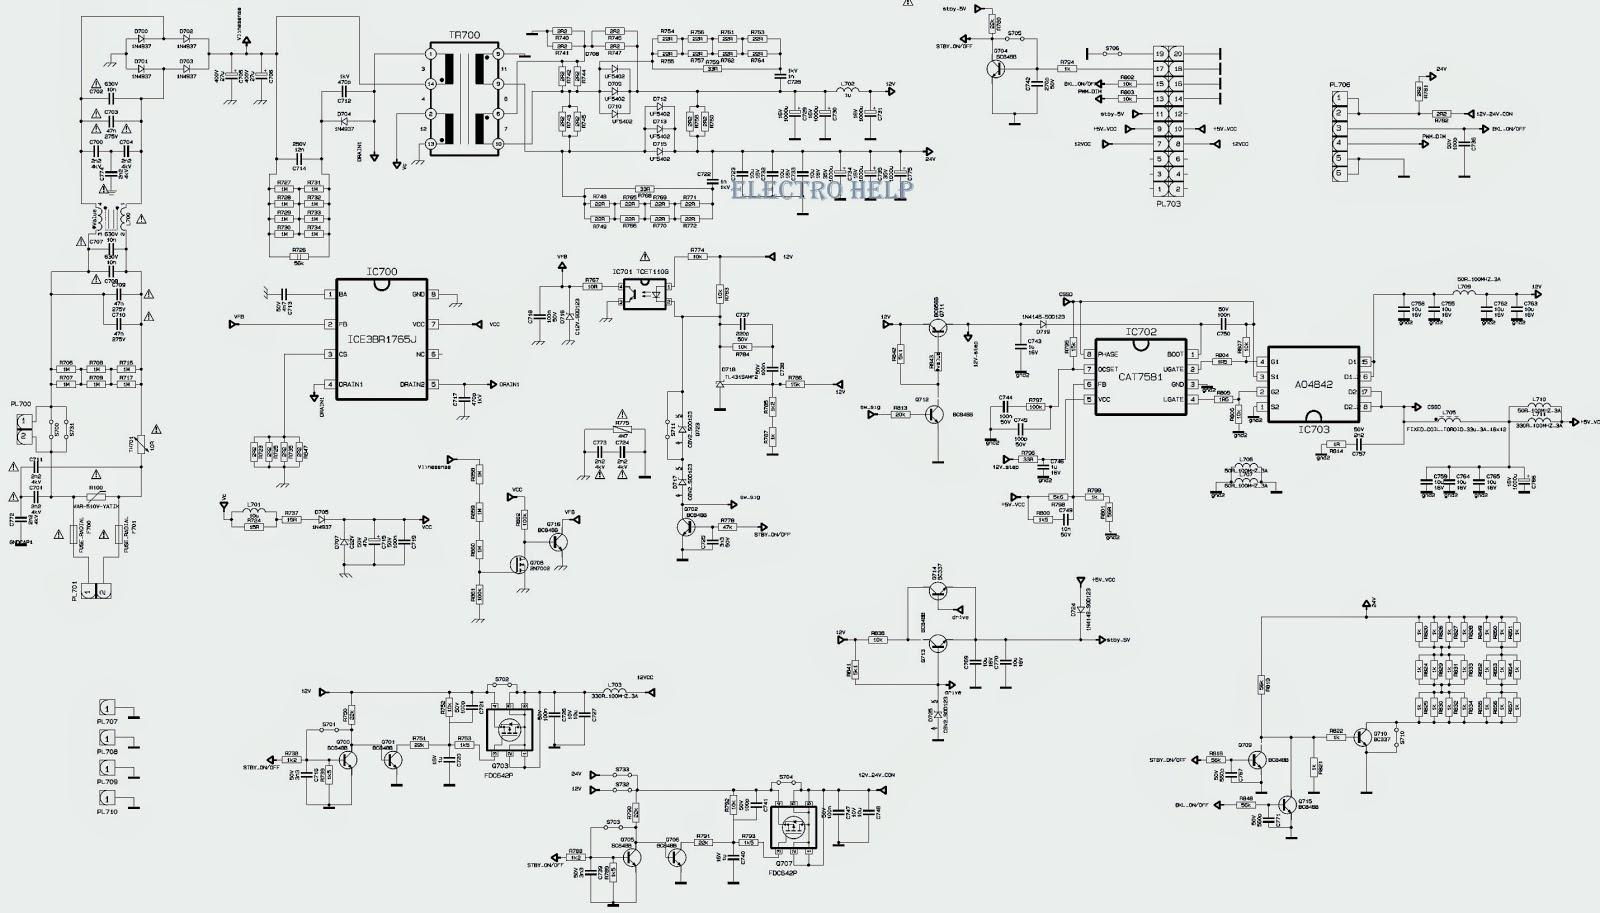 Sharp Lc24le510 Led Tv Power Supply  Smps   U0026 Led Converter Circuit Diagram